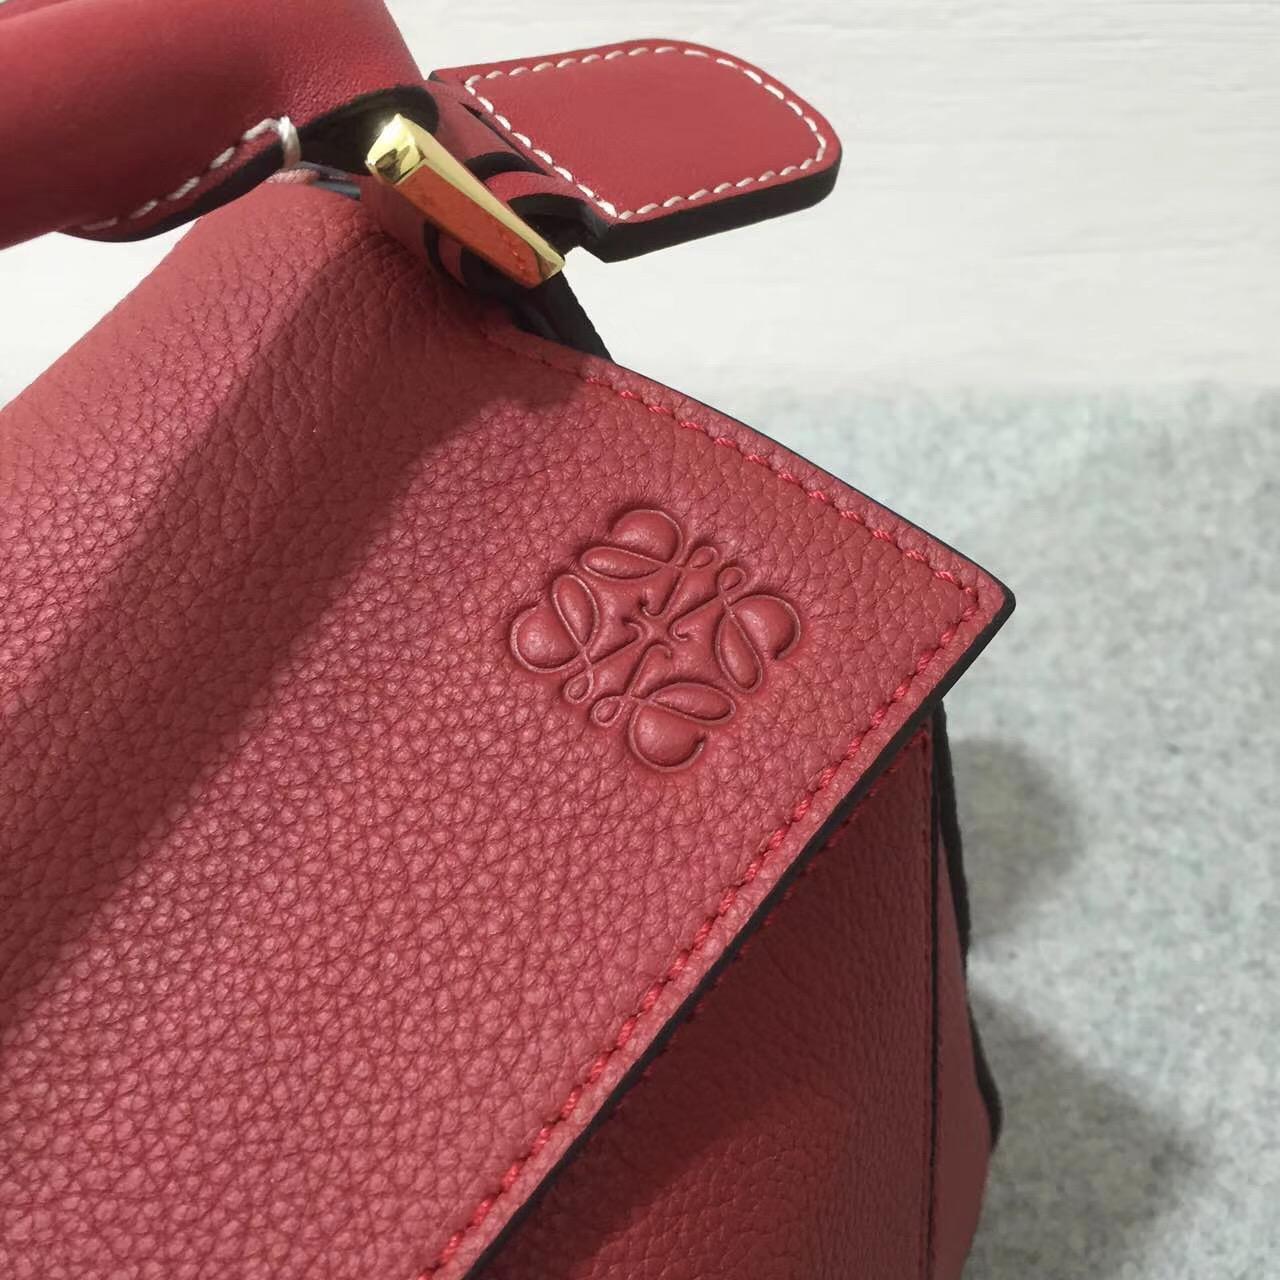 Loewe羅意威小號 Puzzle Small Bag 胭脂红顆粒小牛皮